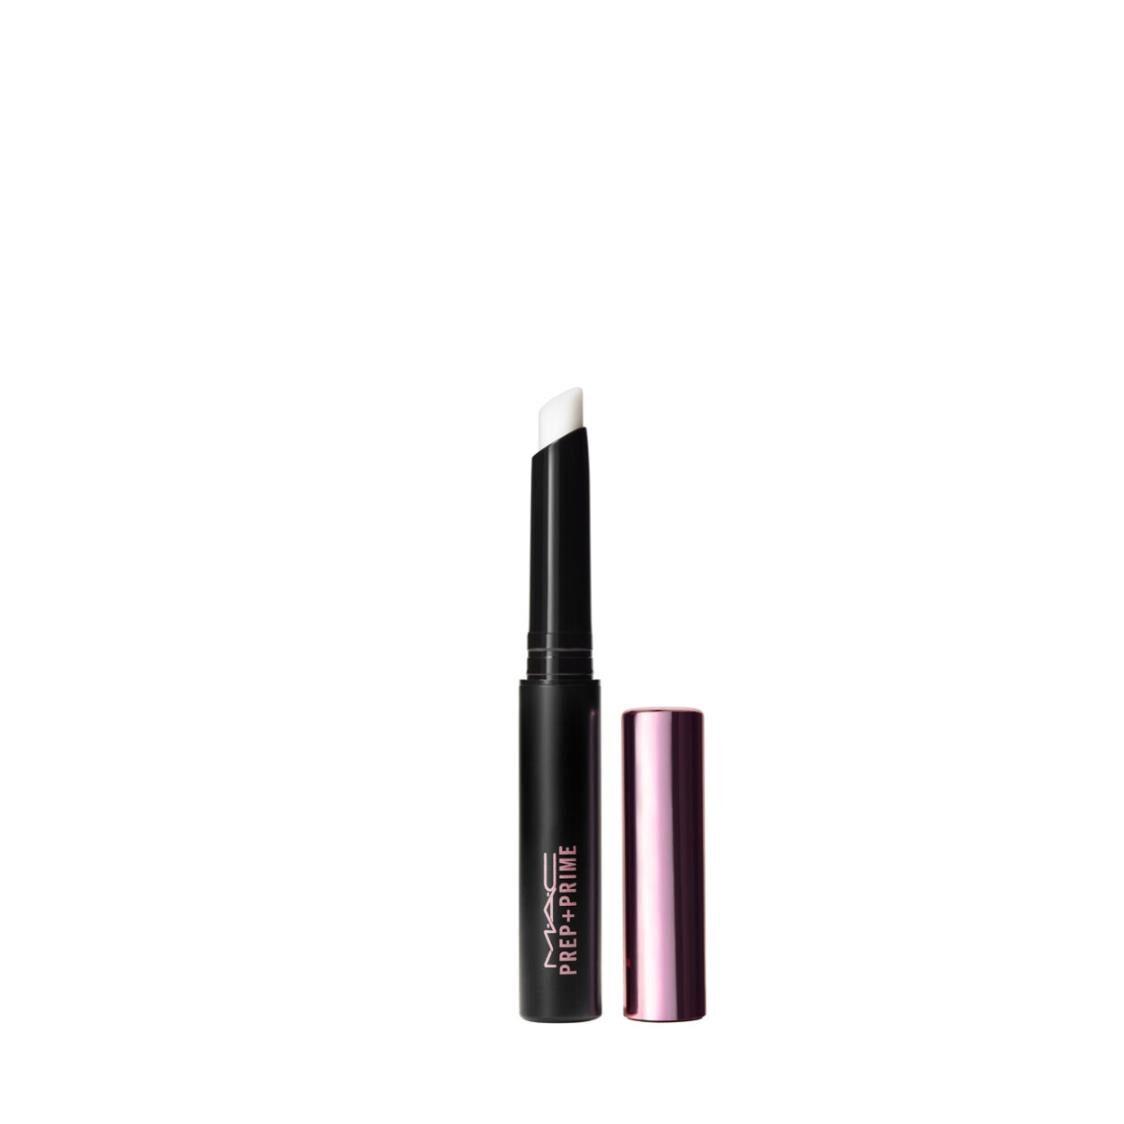 MAC Black Cherry Limited Edition  Prep  Prime Lip Primer